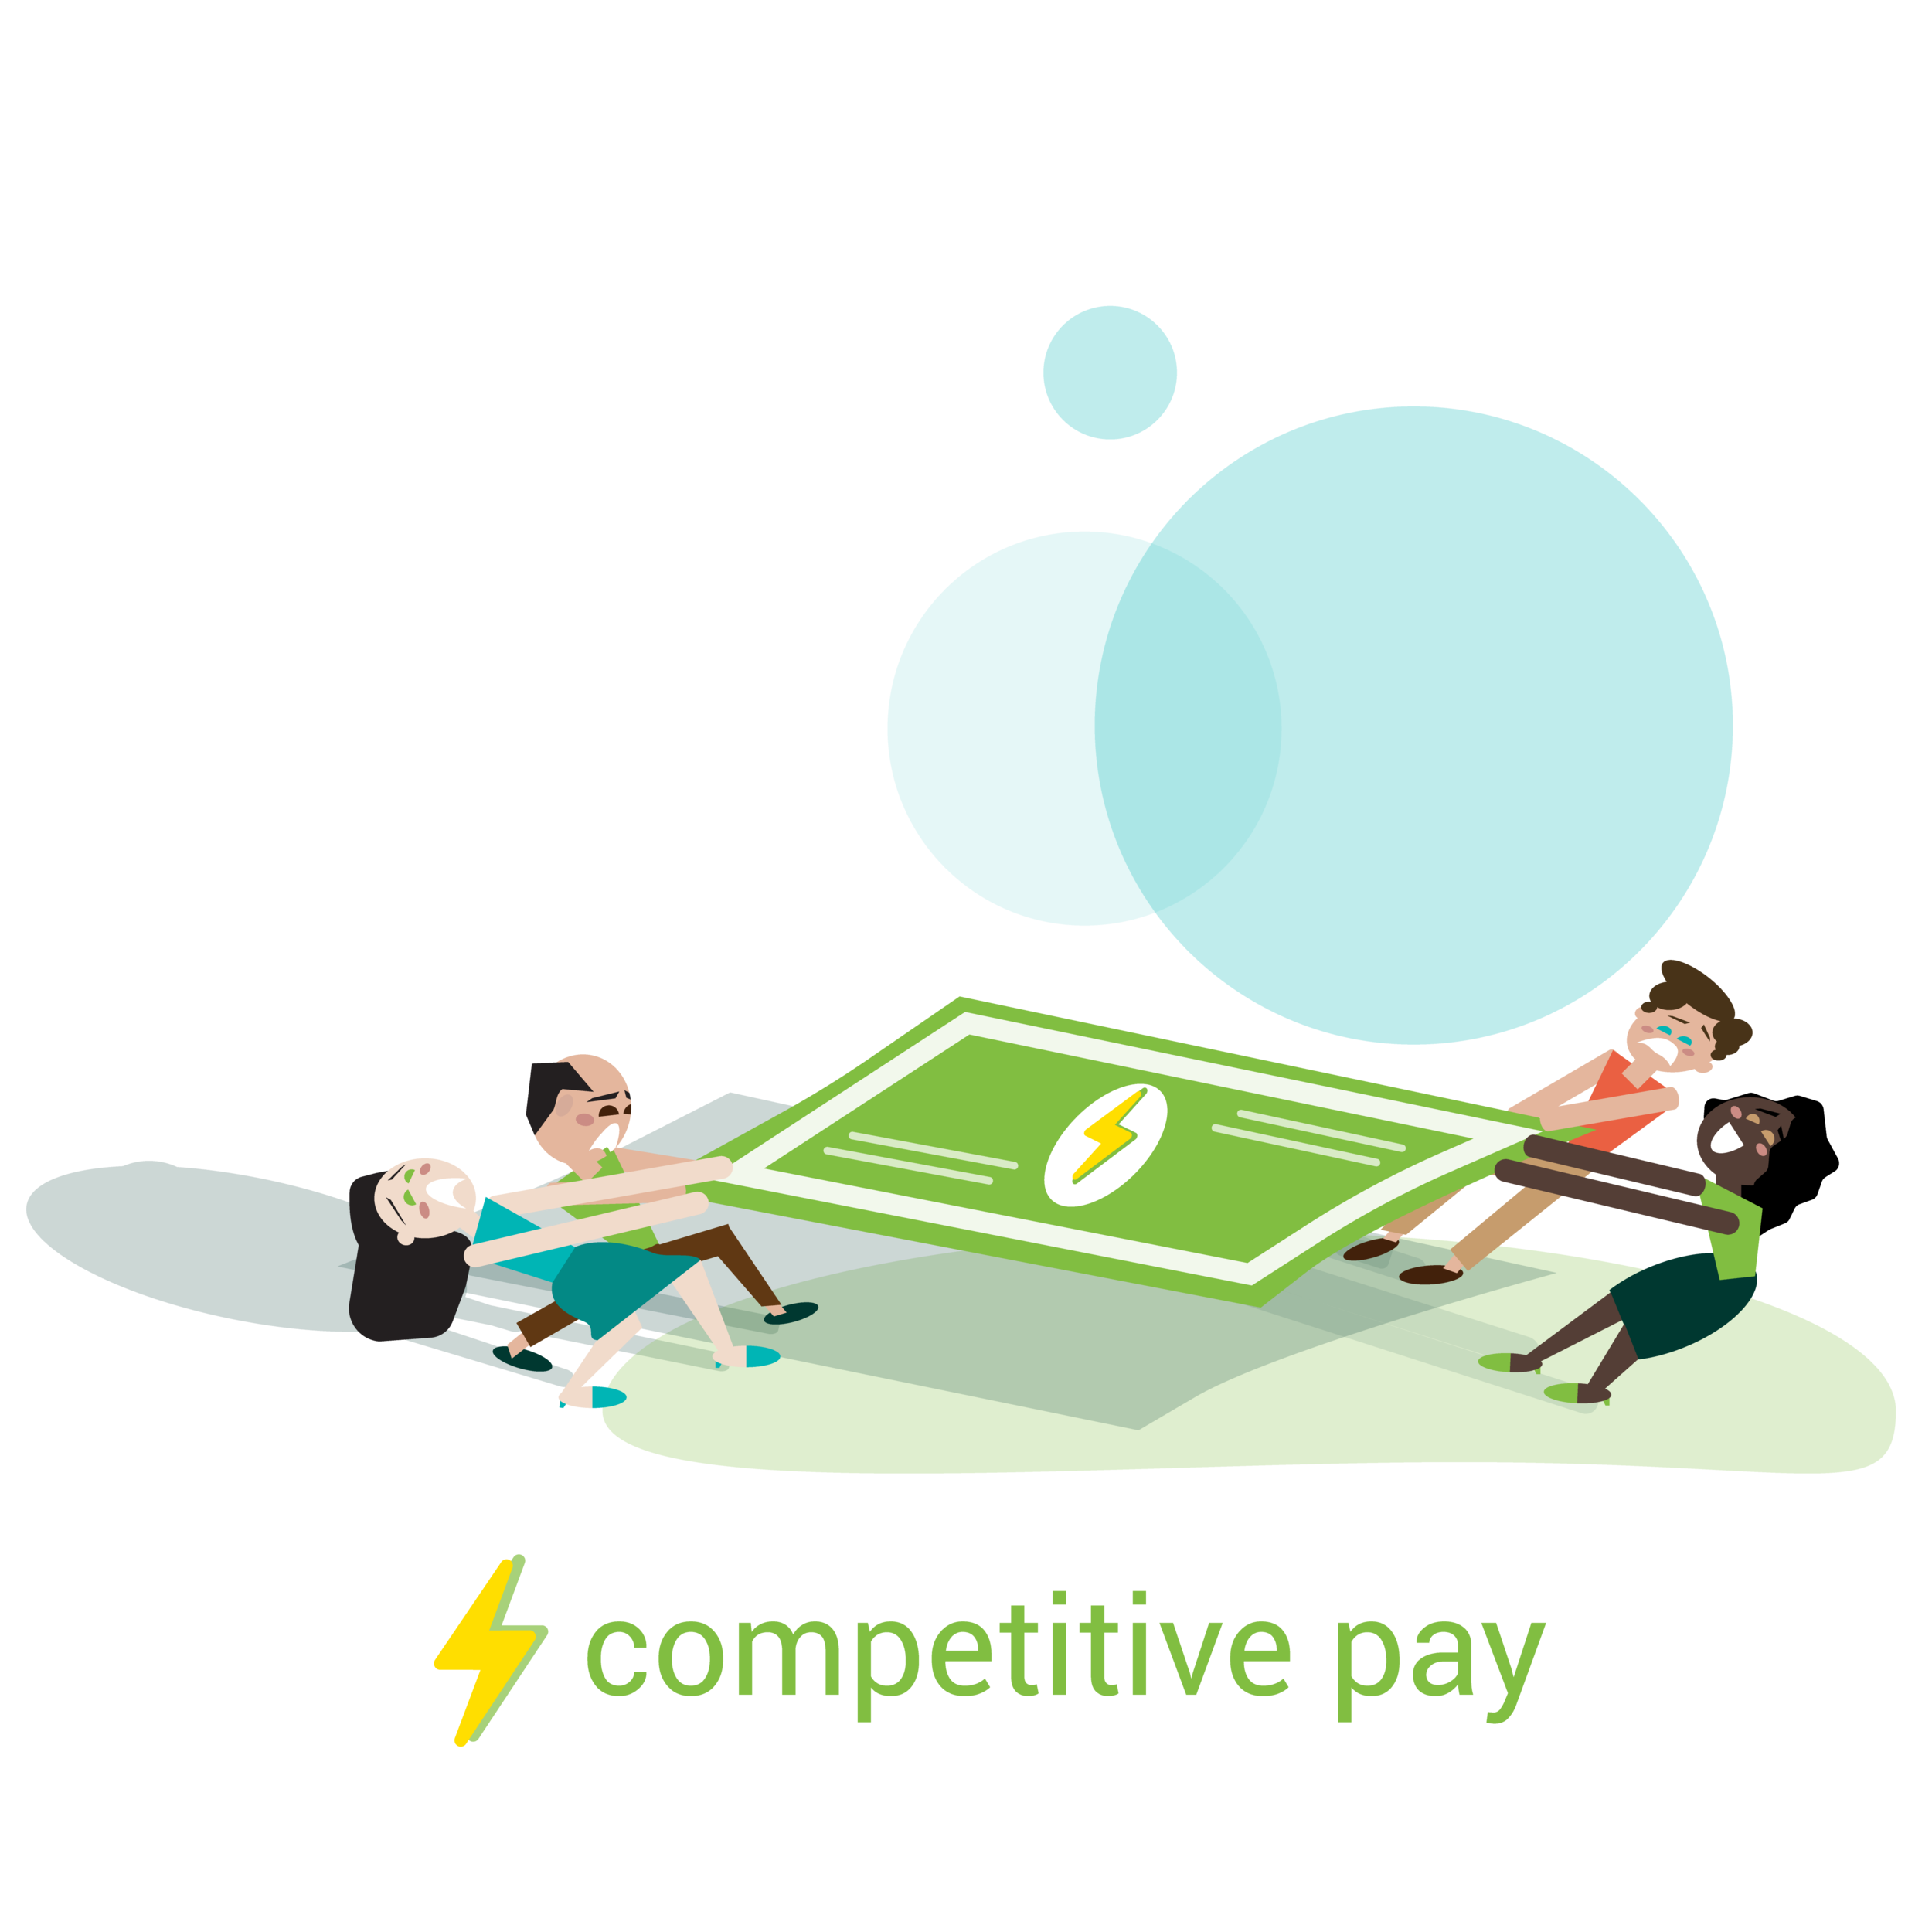 FINAL-UND-company-perks-illus_comp-pay-txt-und.png